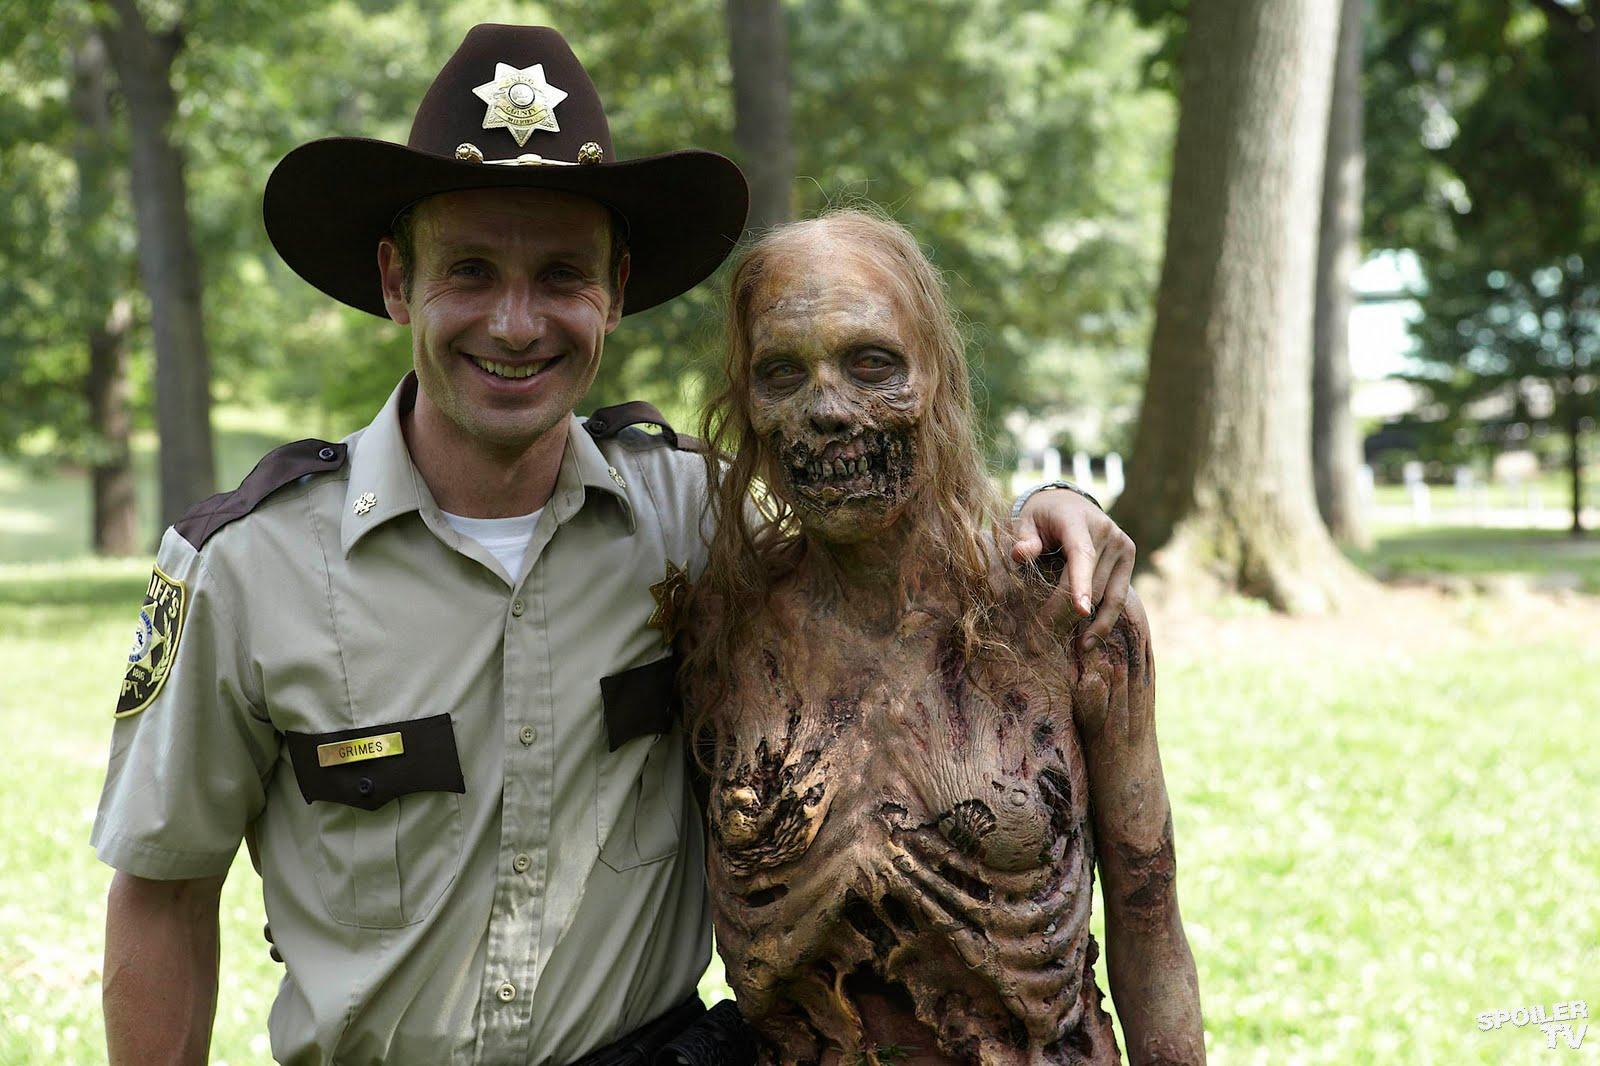 -series/16625212/The-Walking-Dead-Serie-Completa-720P-MEGA.html